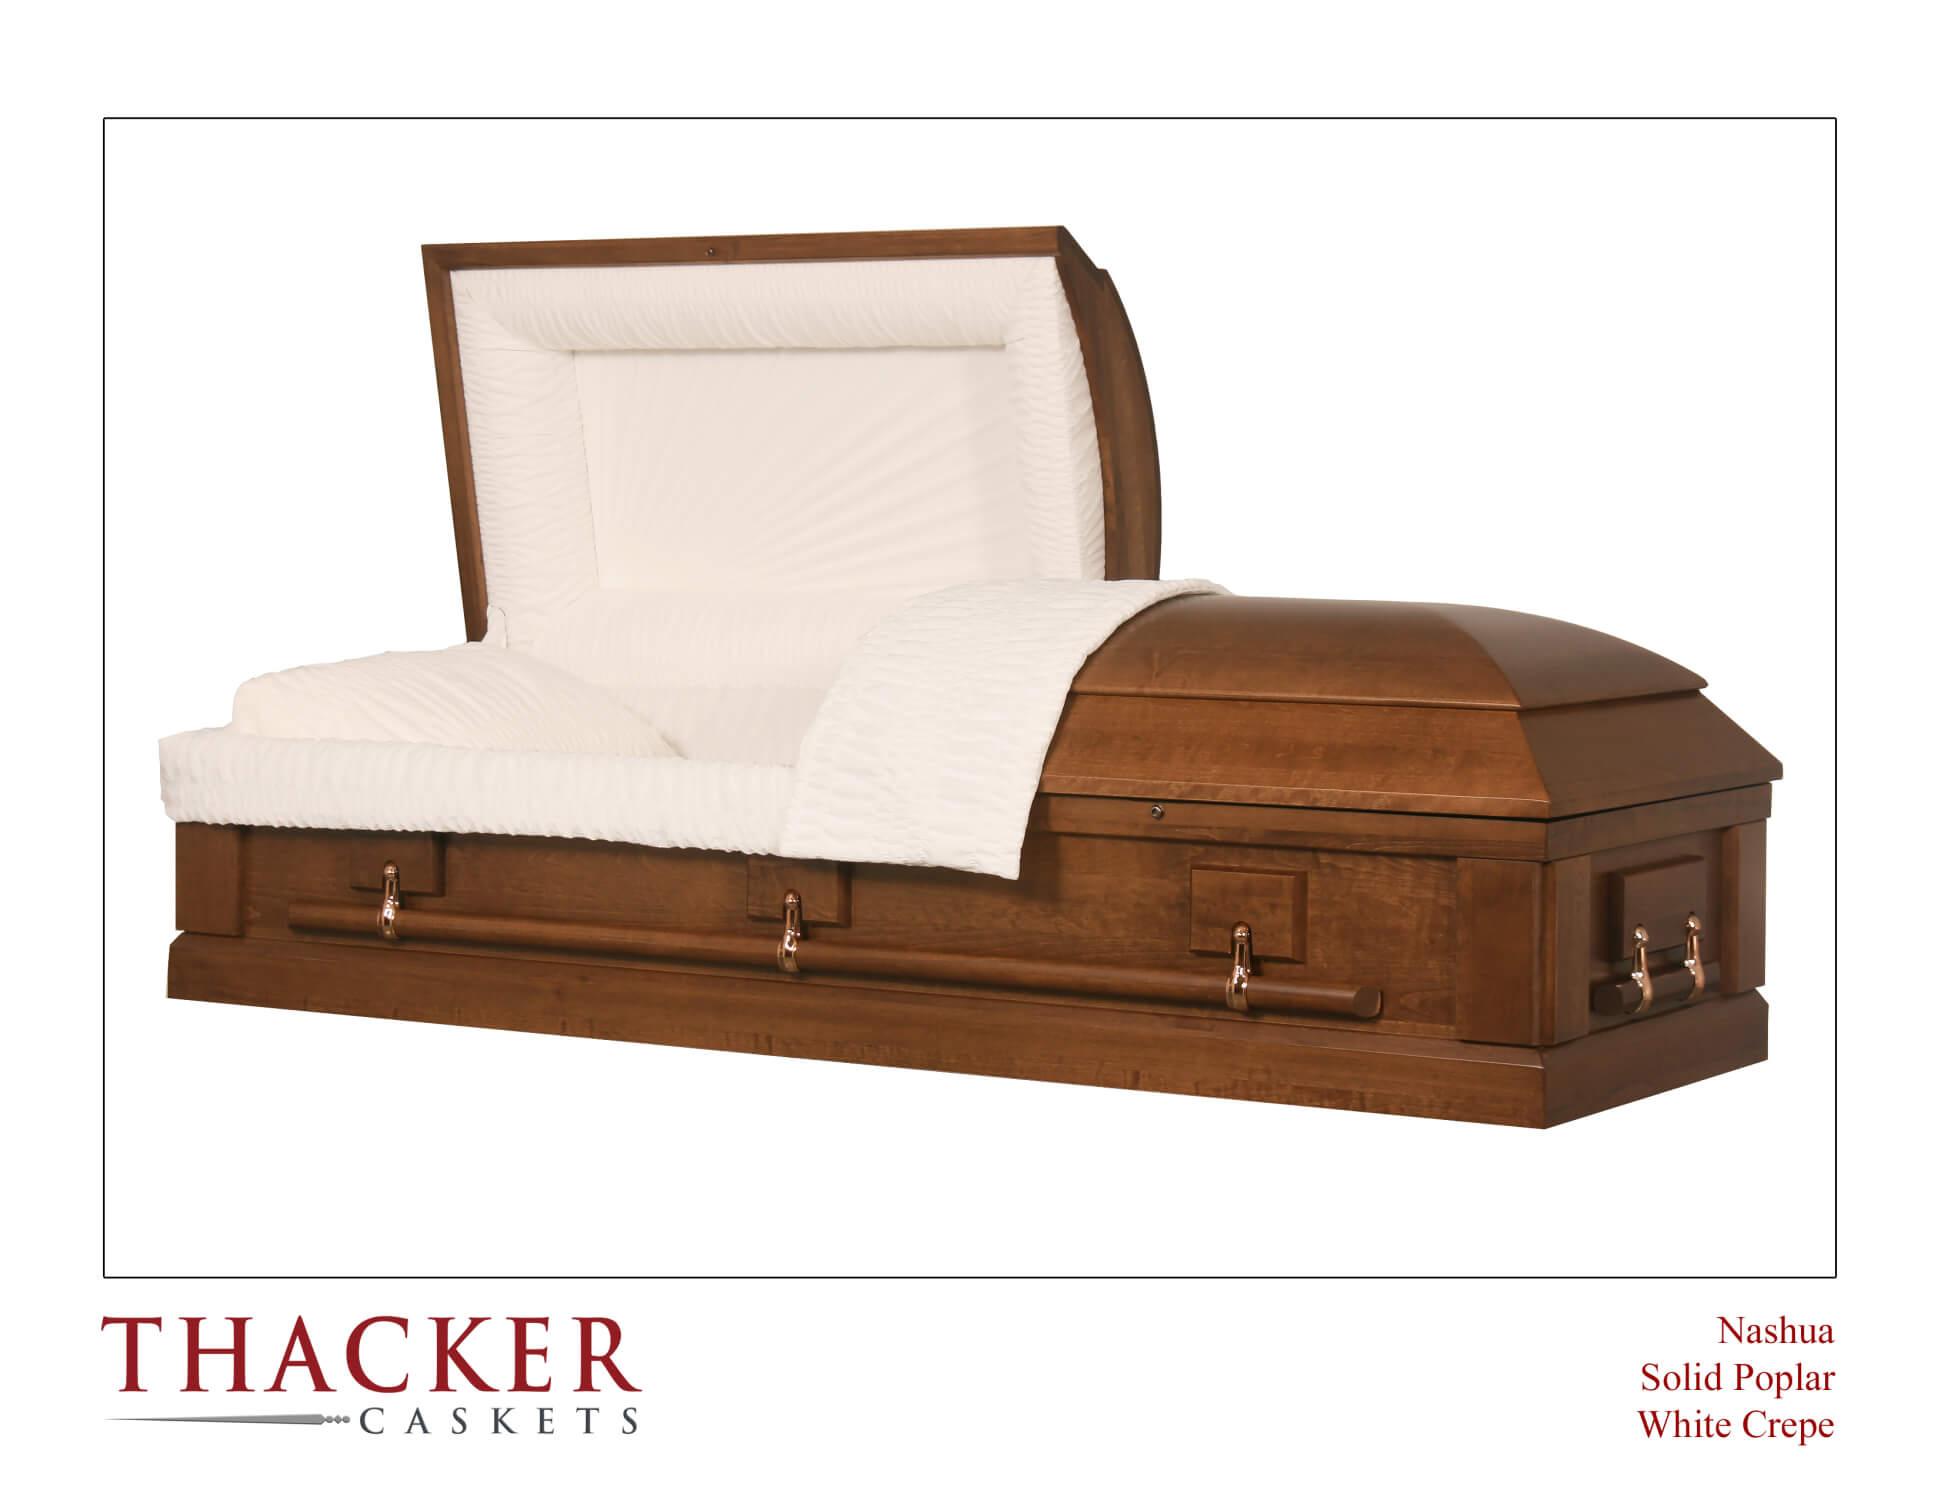 Poplar Wood Casket - $2,095.00